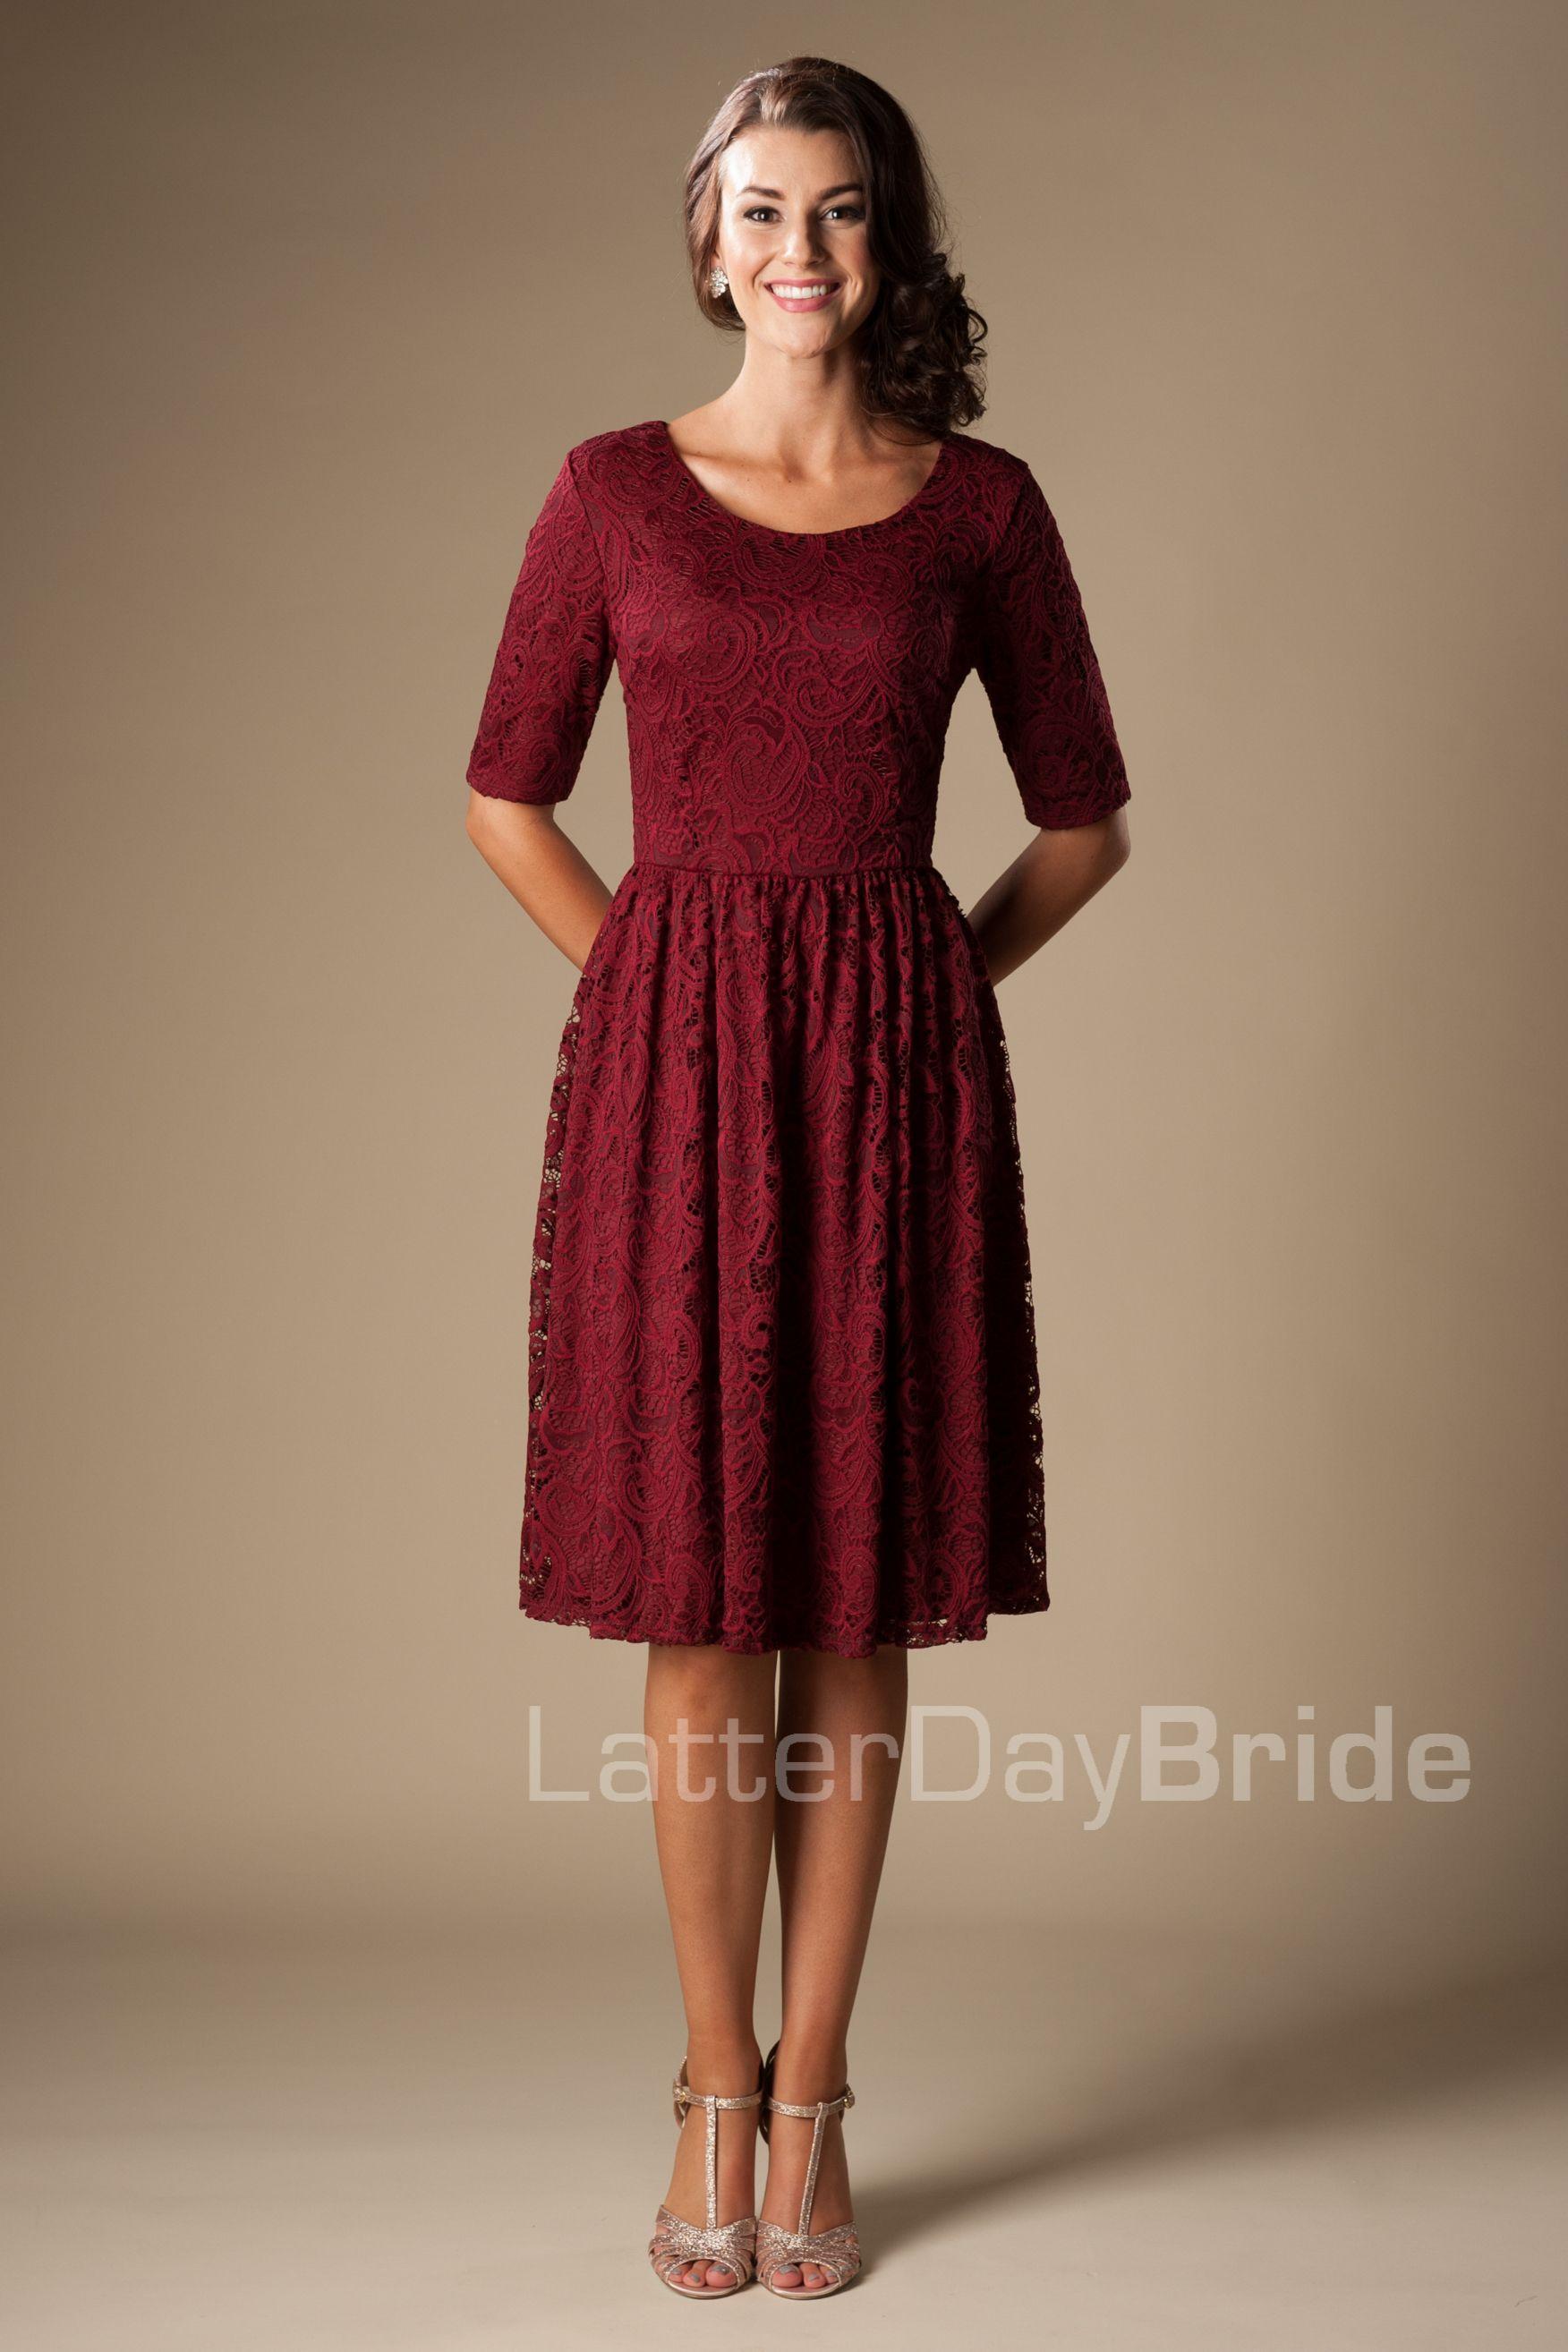 modest bridesmaid dress mw22880 burgundy 55. Black Bedroom Furniture Sets. Home Design Ideas